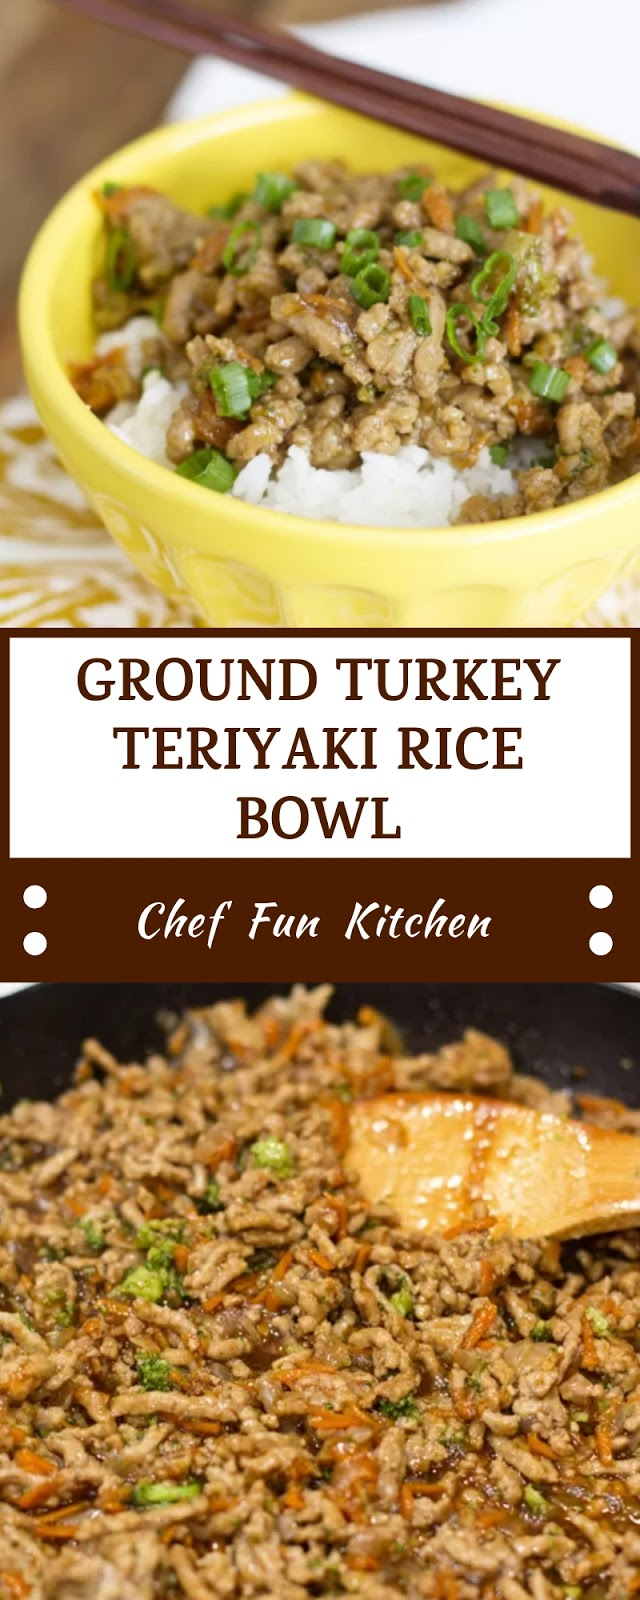 GROUND TURKEY TERIYAKI RICE BOWL